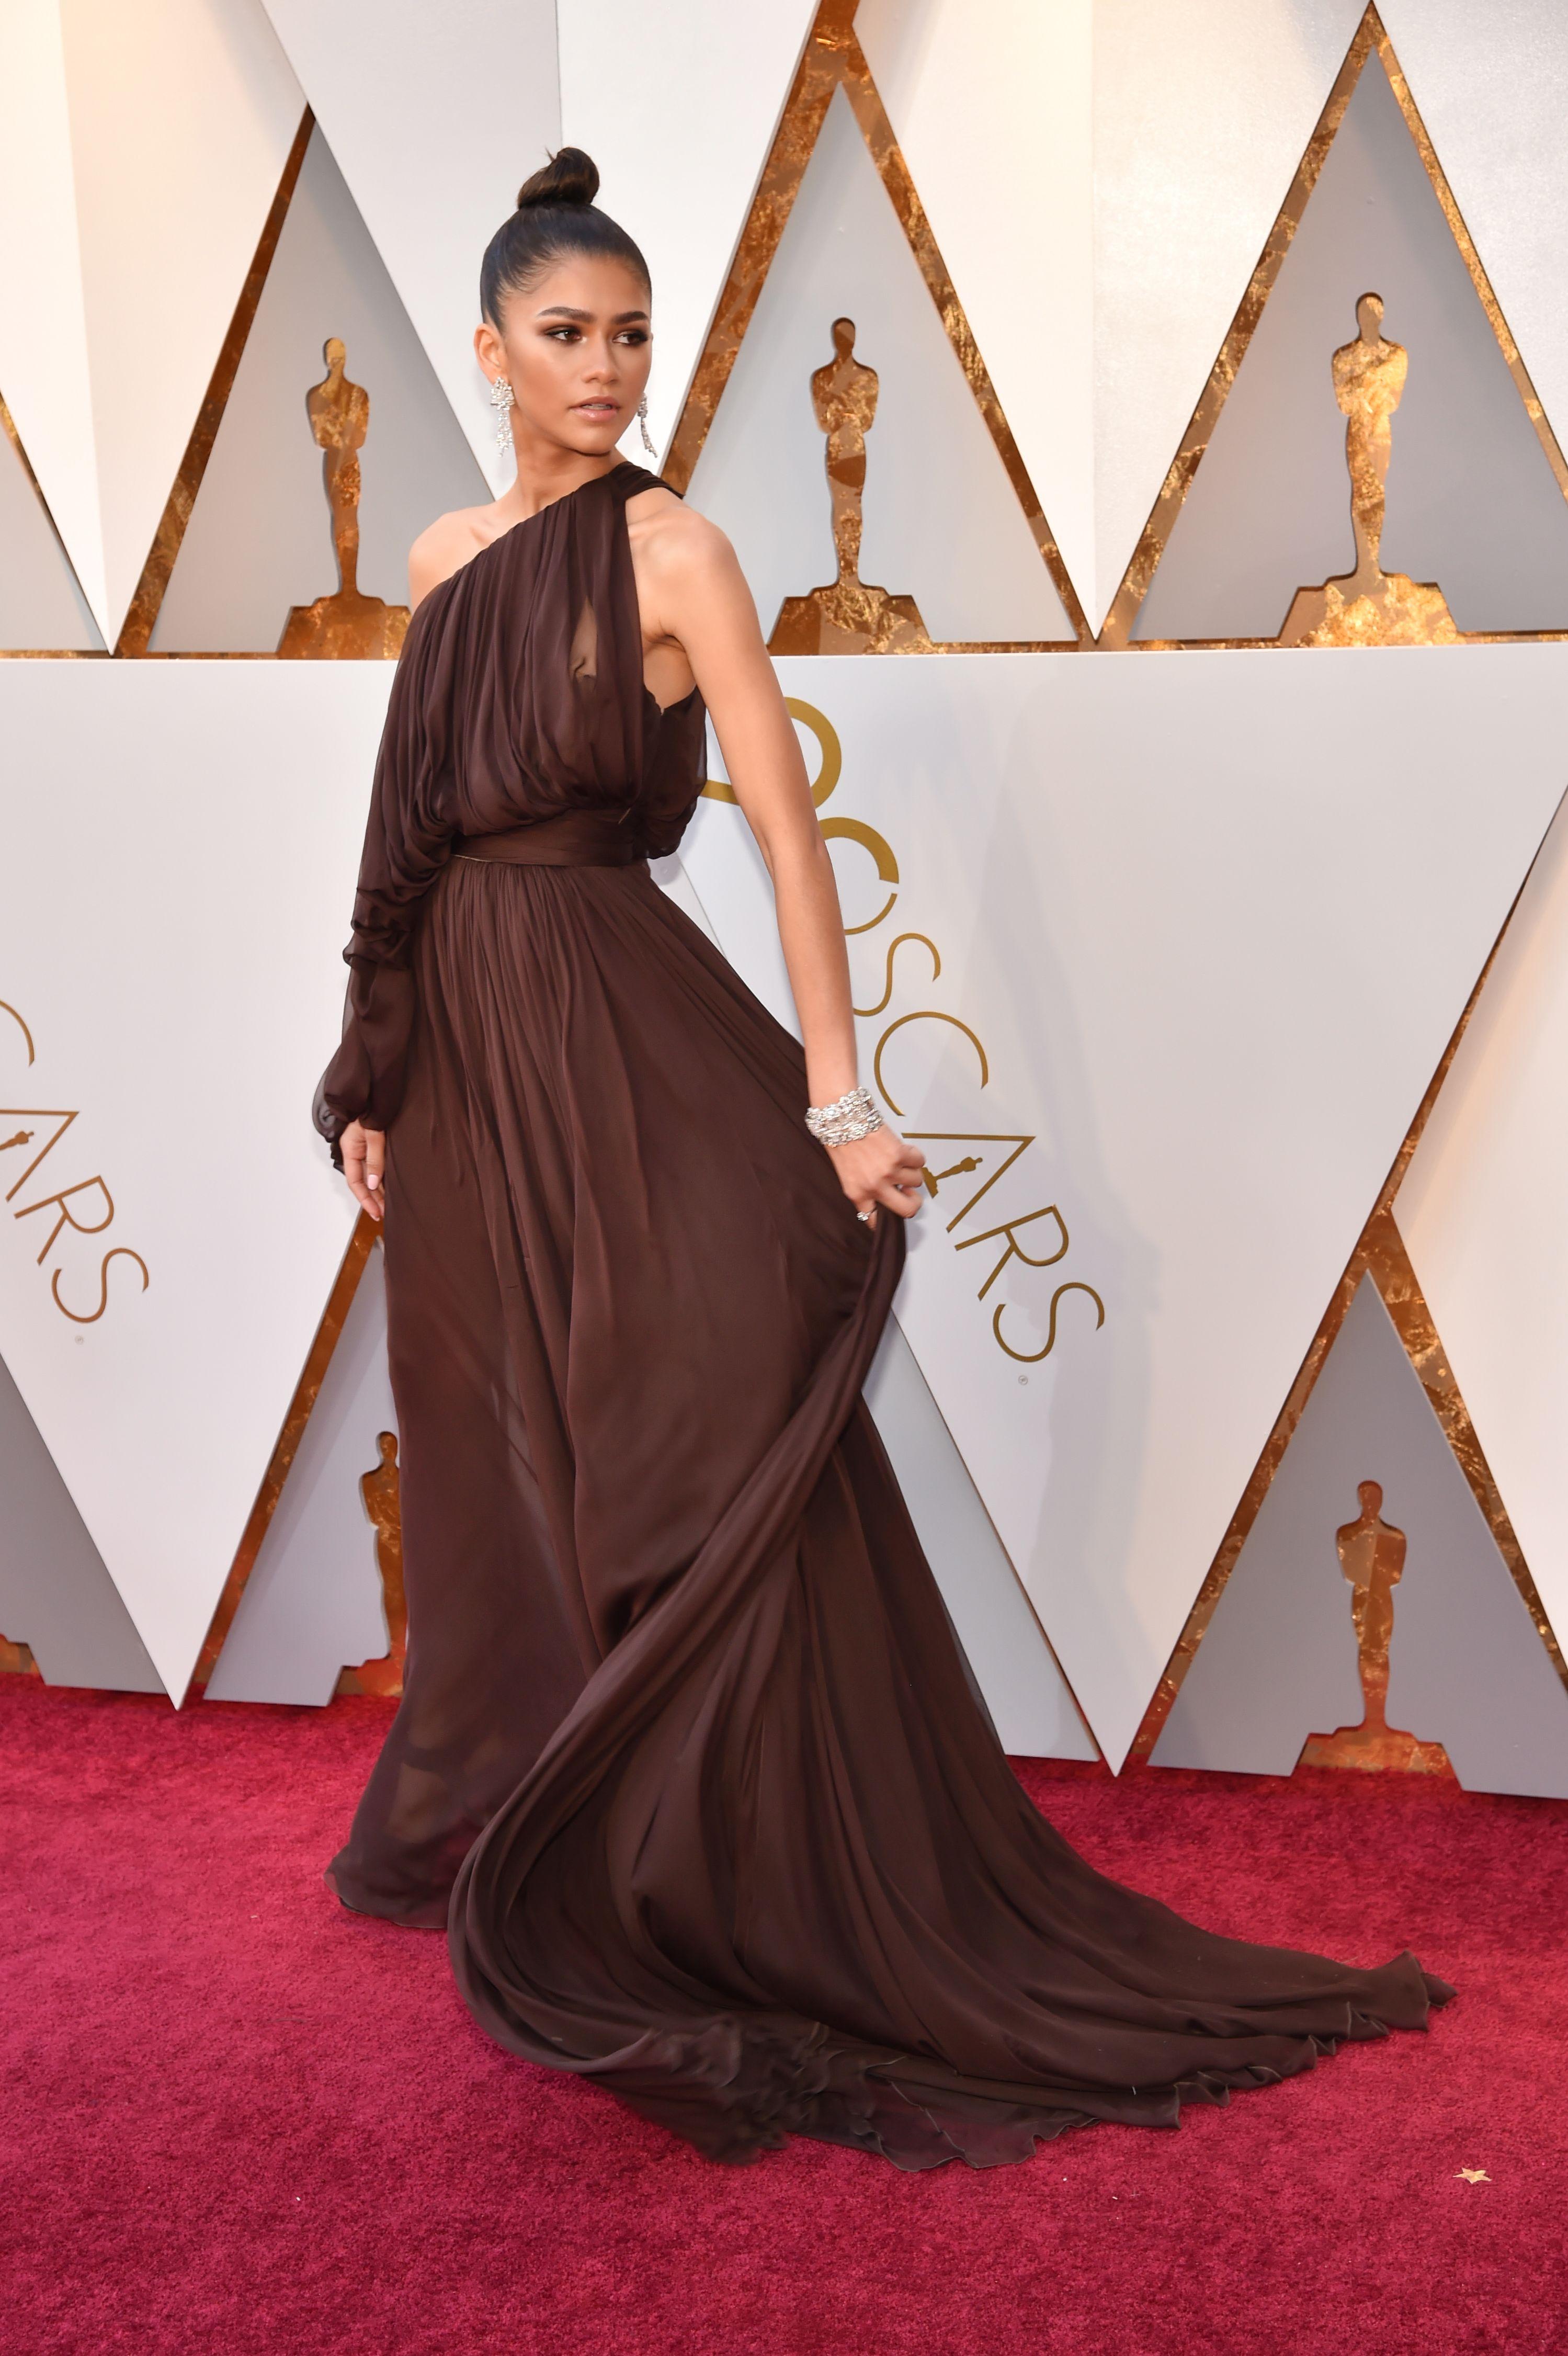 f076182bc Zendaya Oscars 2018 Red Carpet Dress - Zendaya Wears Grecian-Inspired Dress  to Academy Awards